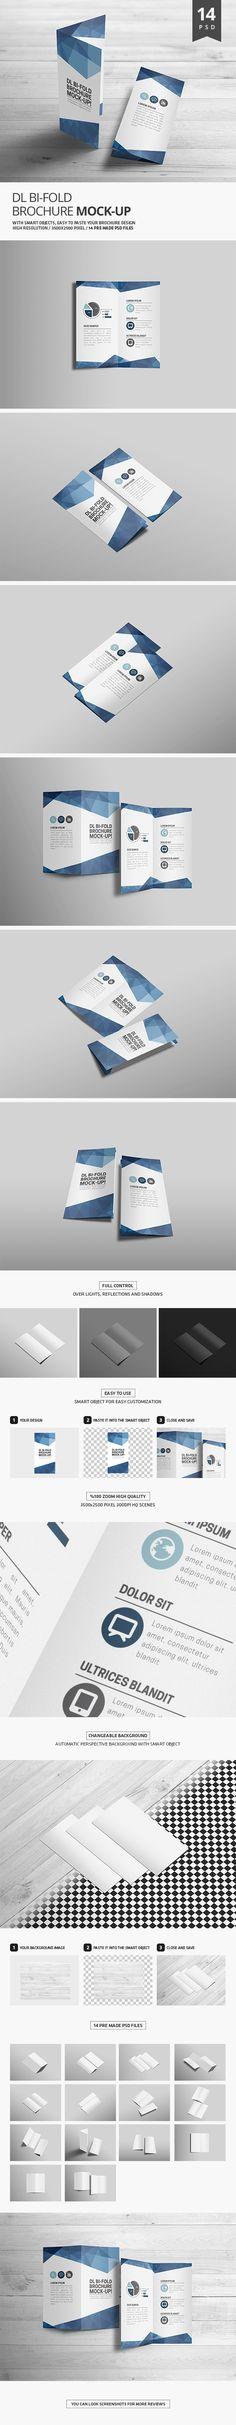 A4 Bi Fold Brochure Mockup Template bi fold mock ups Pinterest - half fold brochure template